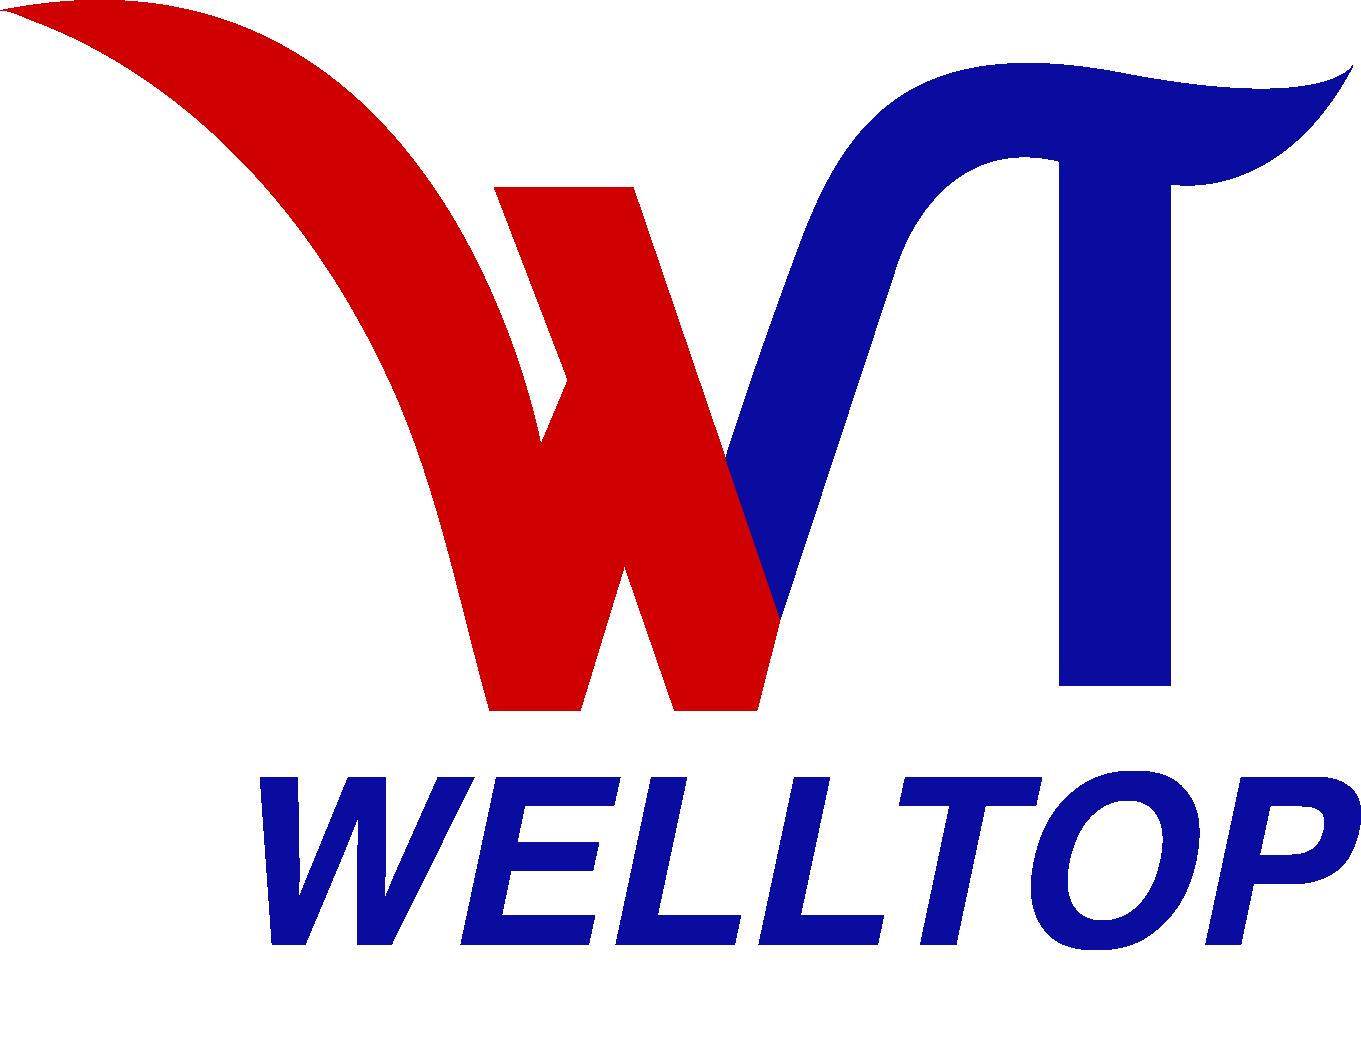 Welltop Fod Ingredients Sdn Bhd| Food Ingredients Company